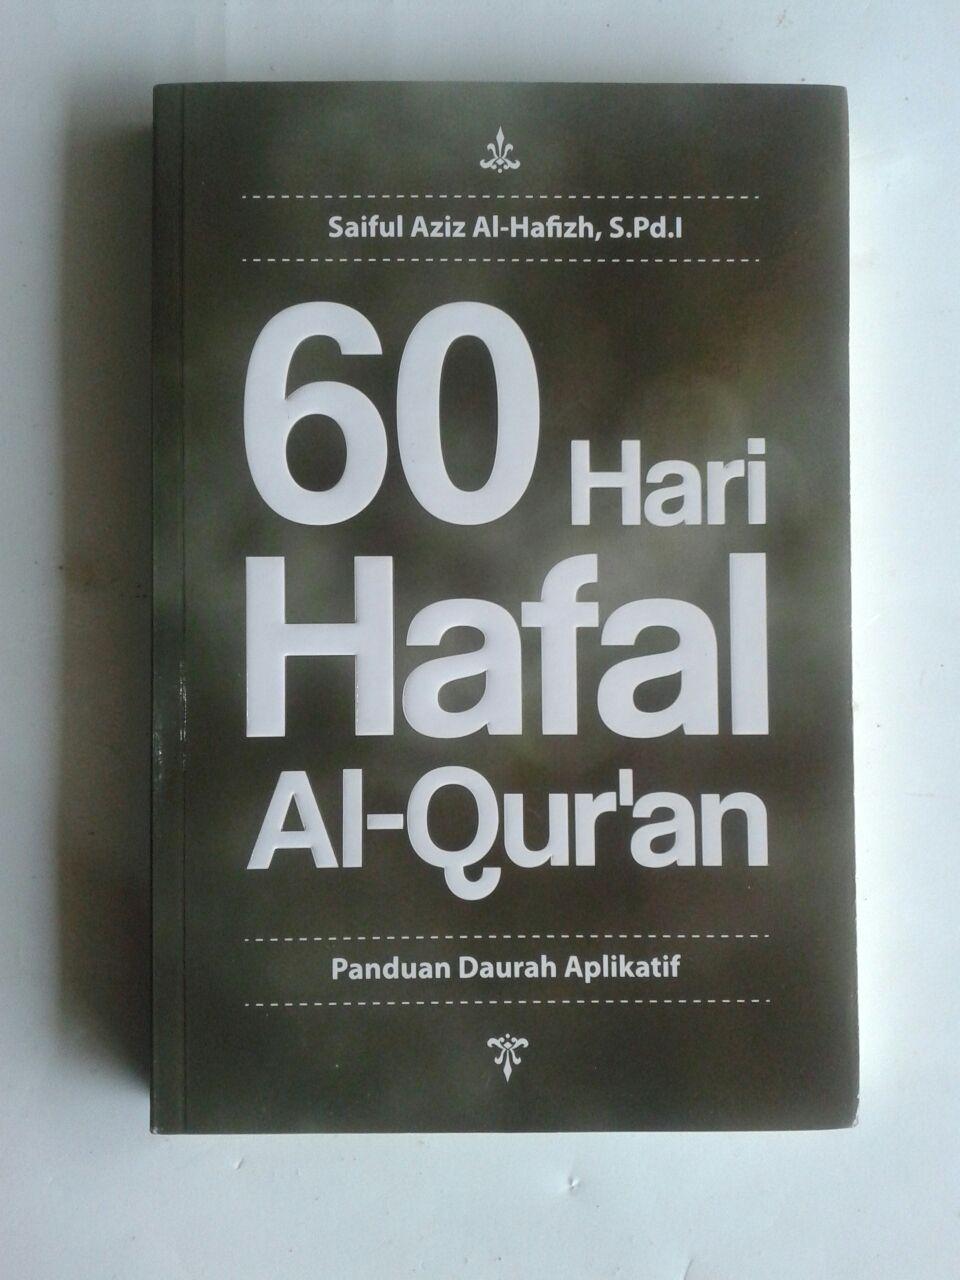 Buku 60 Hari Hafal Al-Qur'an Panduan Daurah Aplikatif cover 2